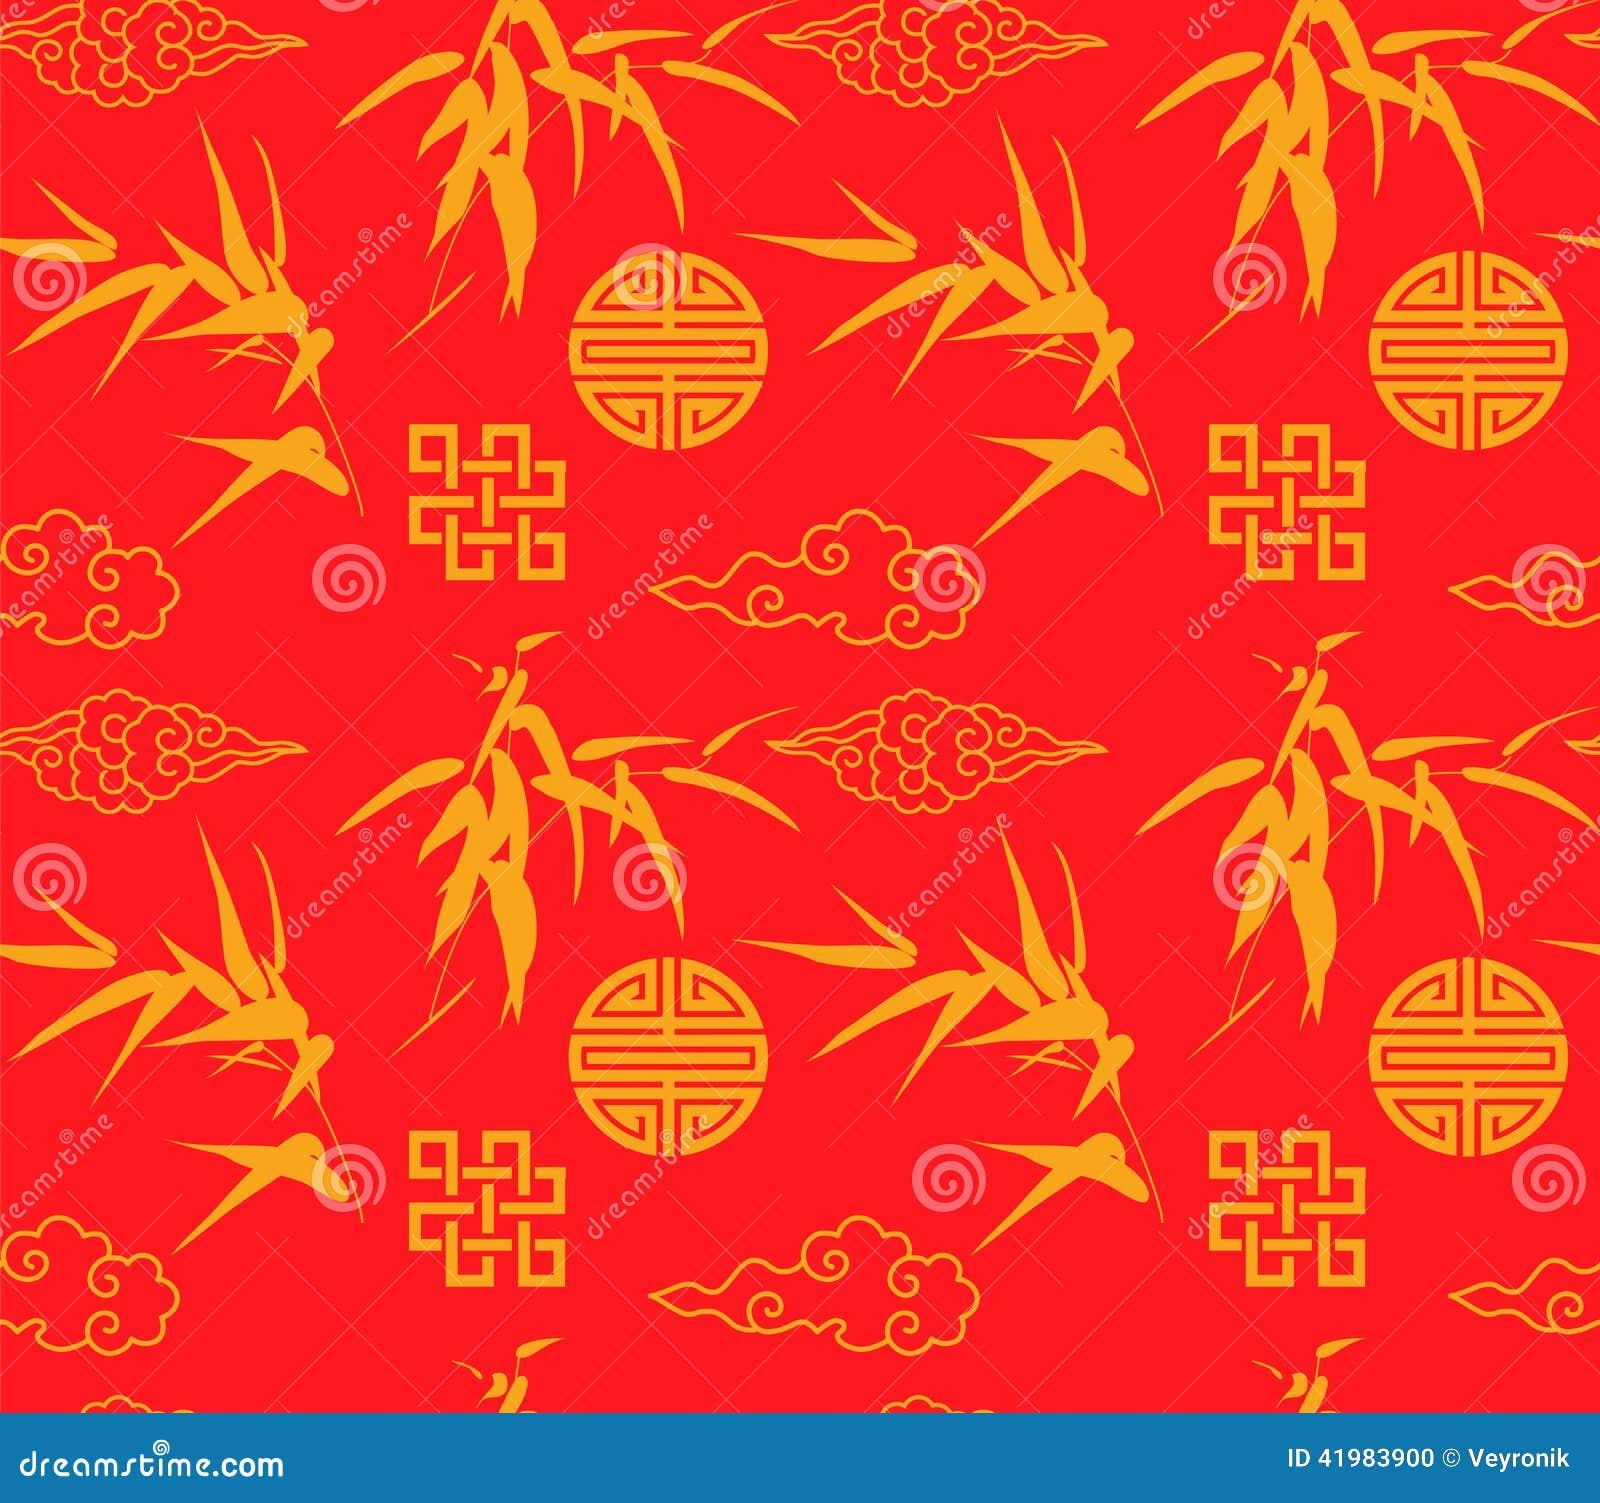 Chinese Bamboo Seamless Background